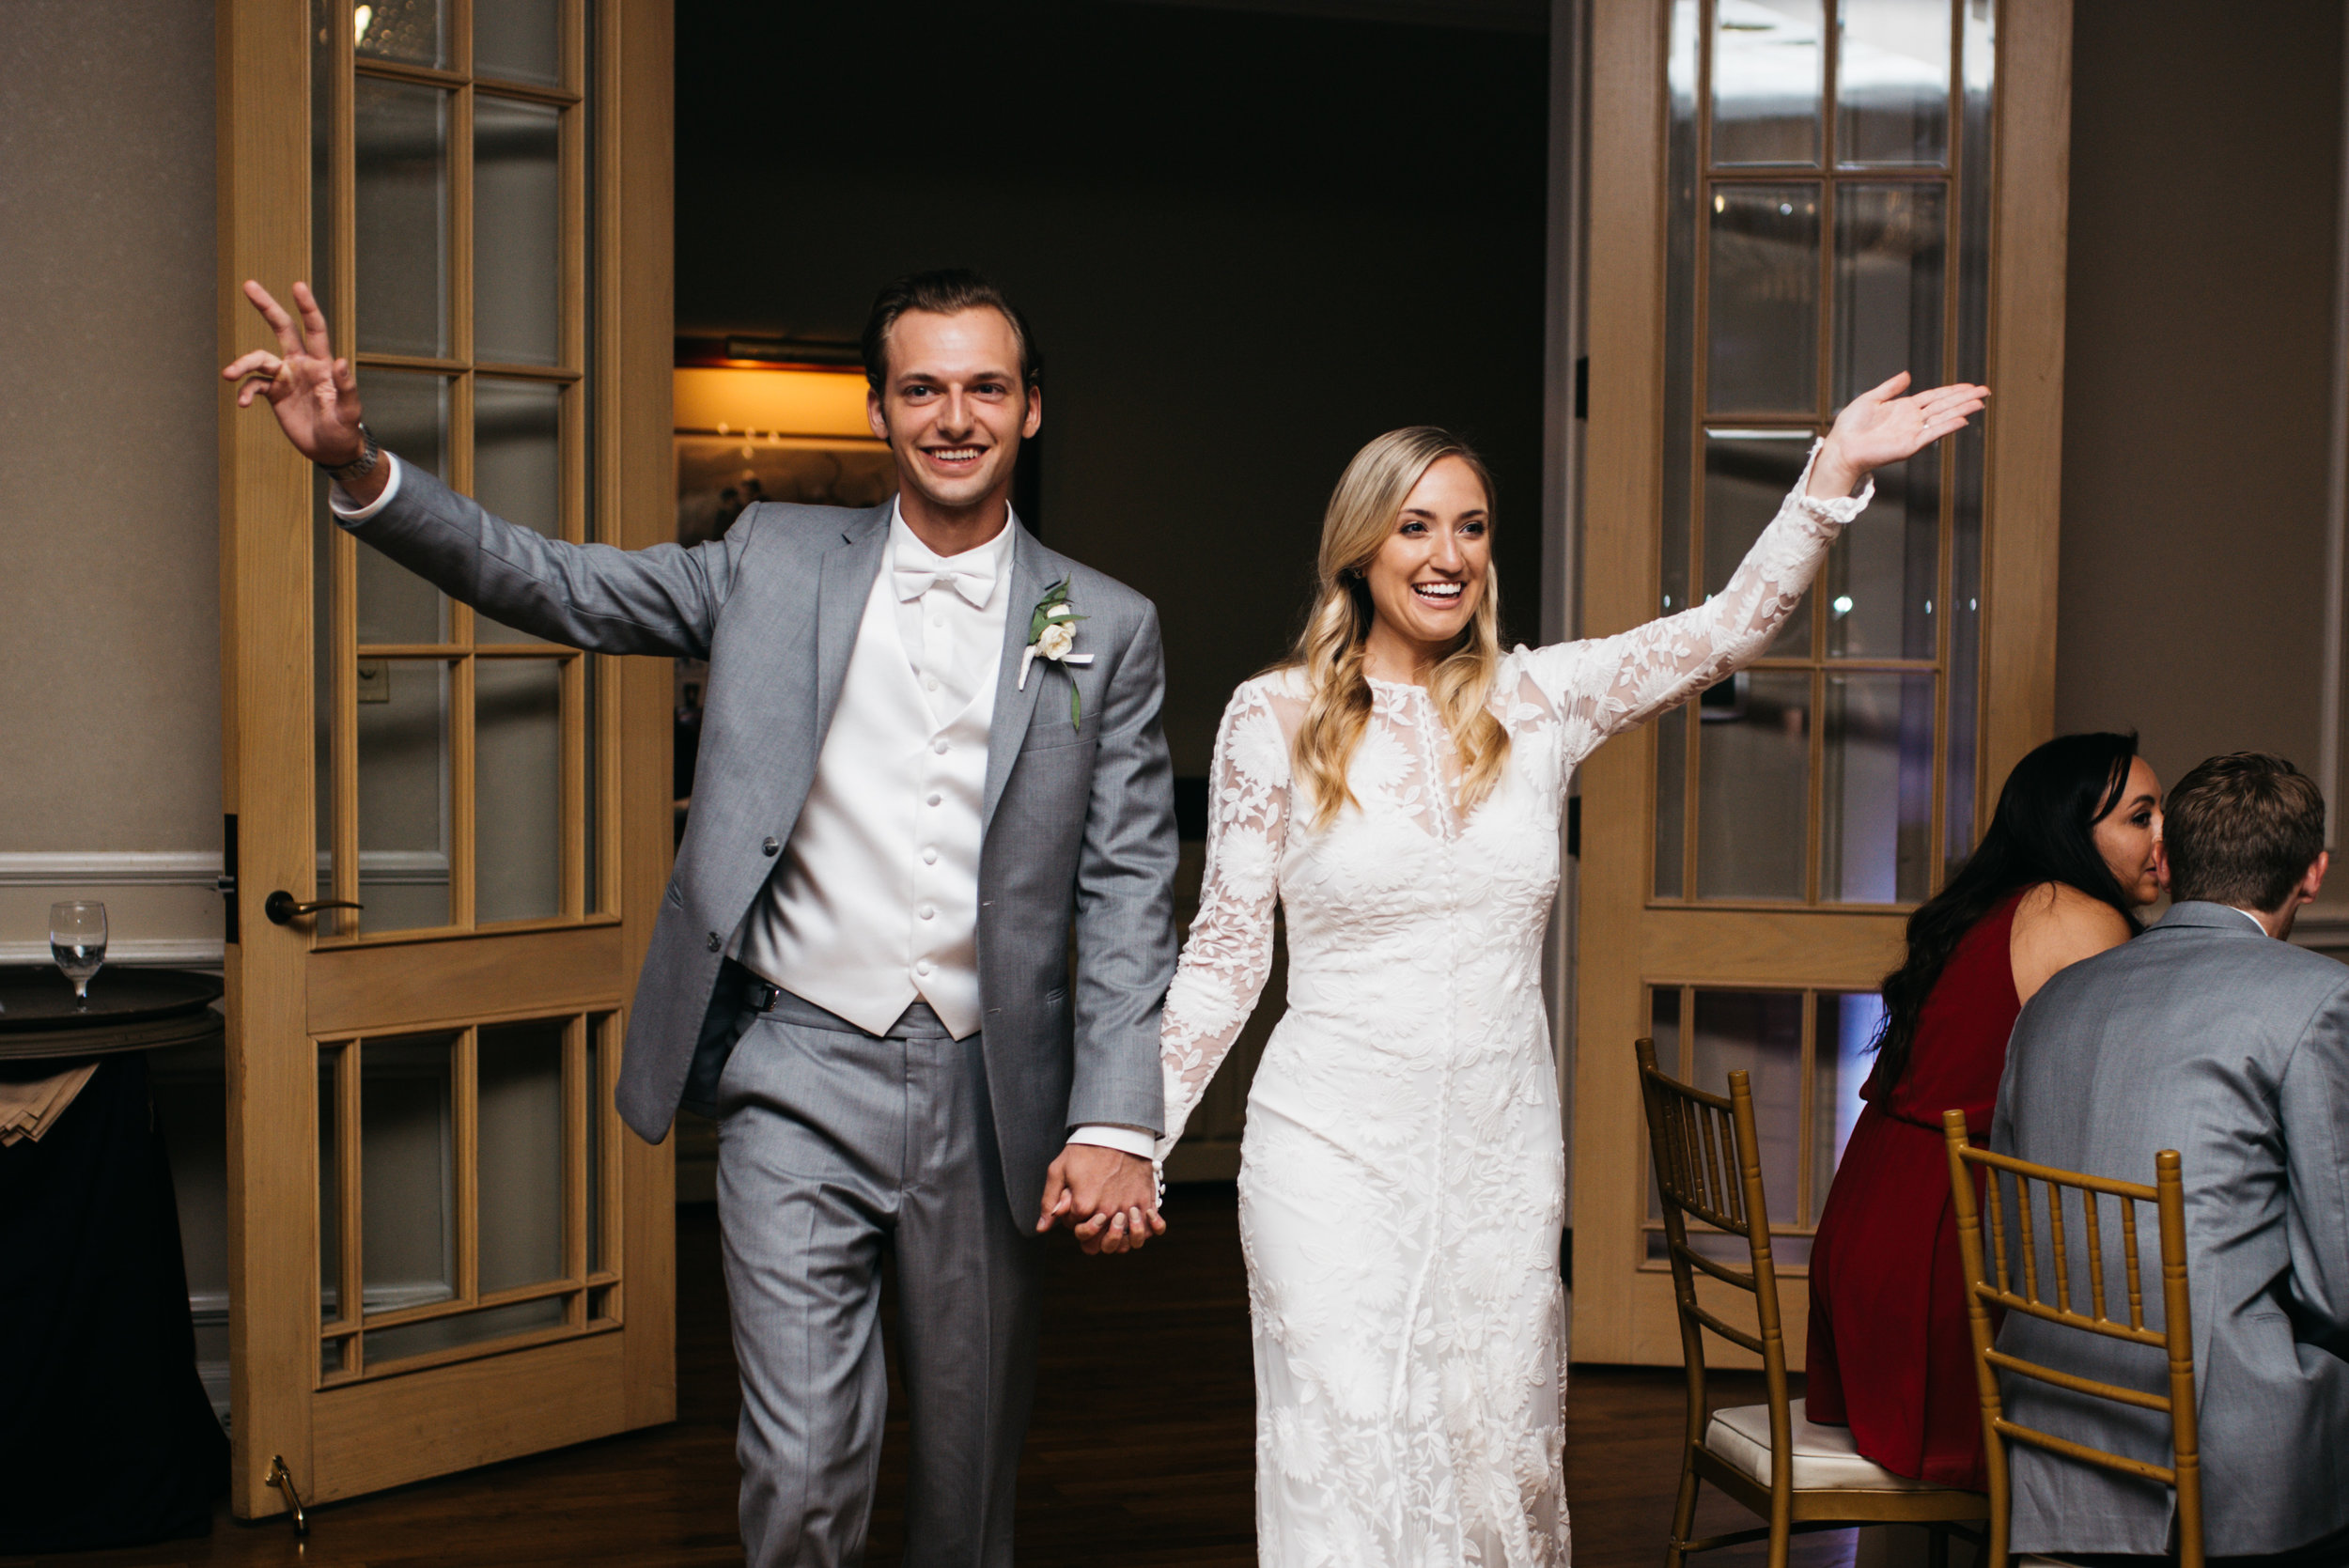 wedding grand entrance.jpg